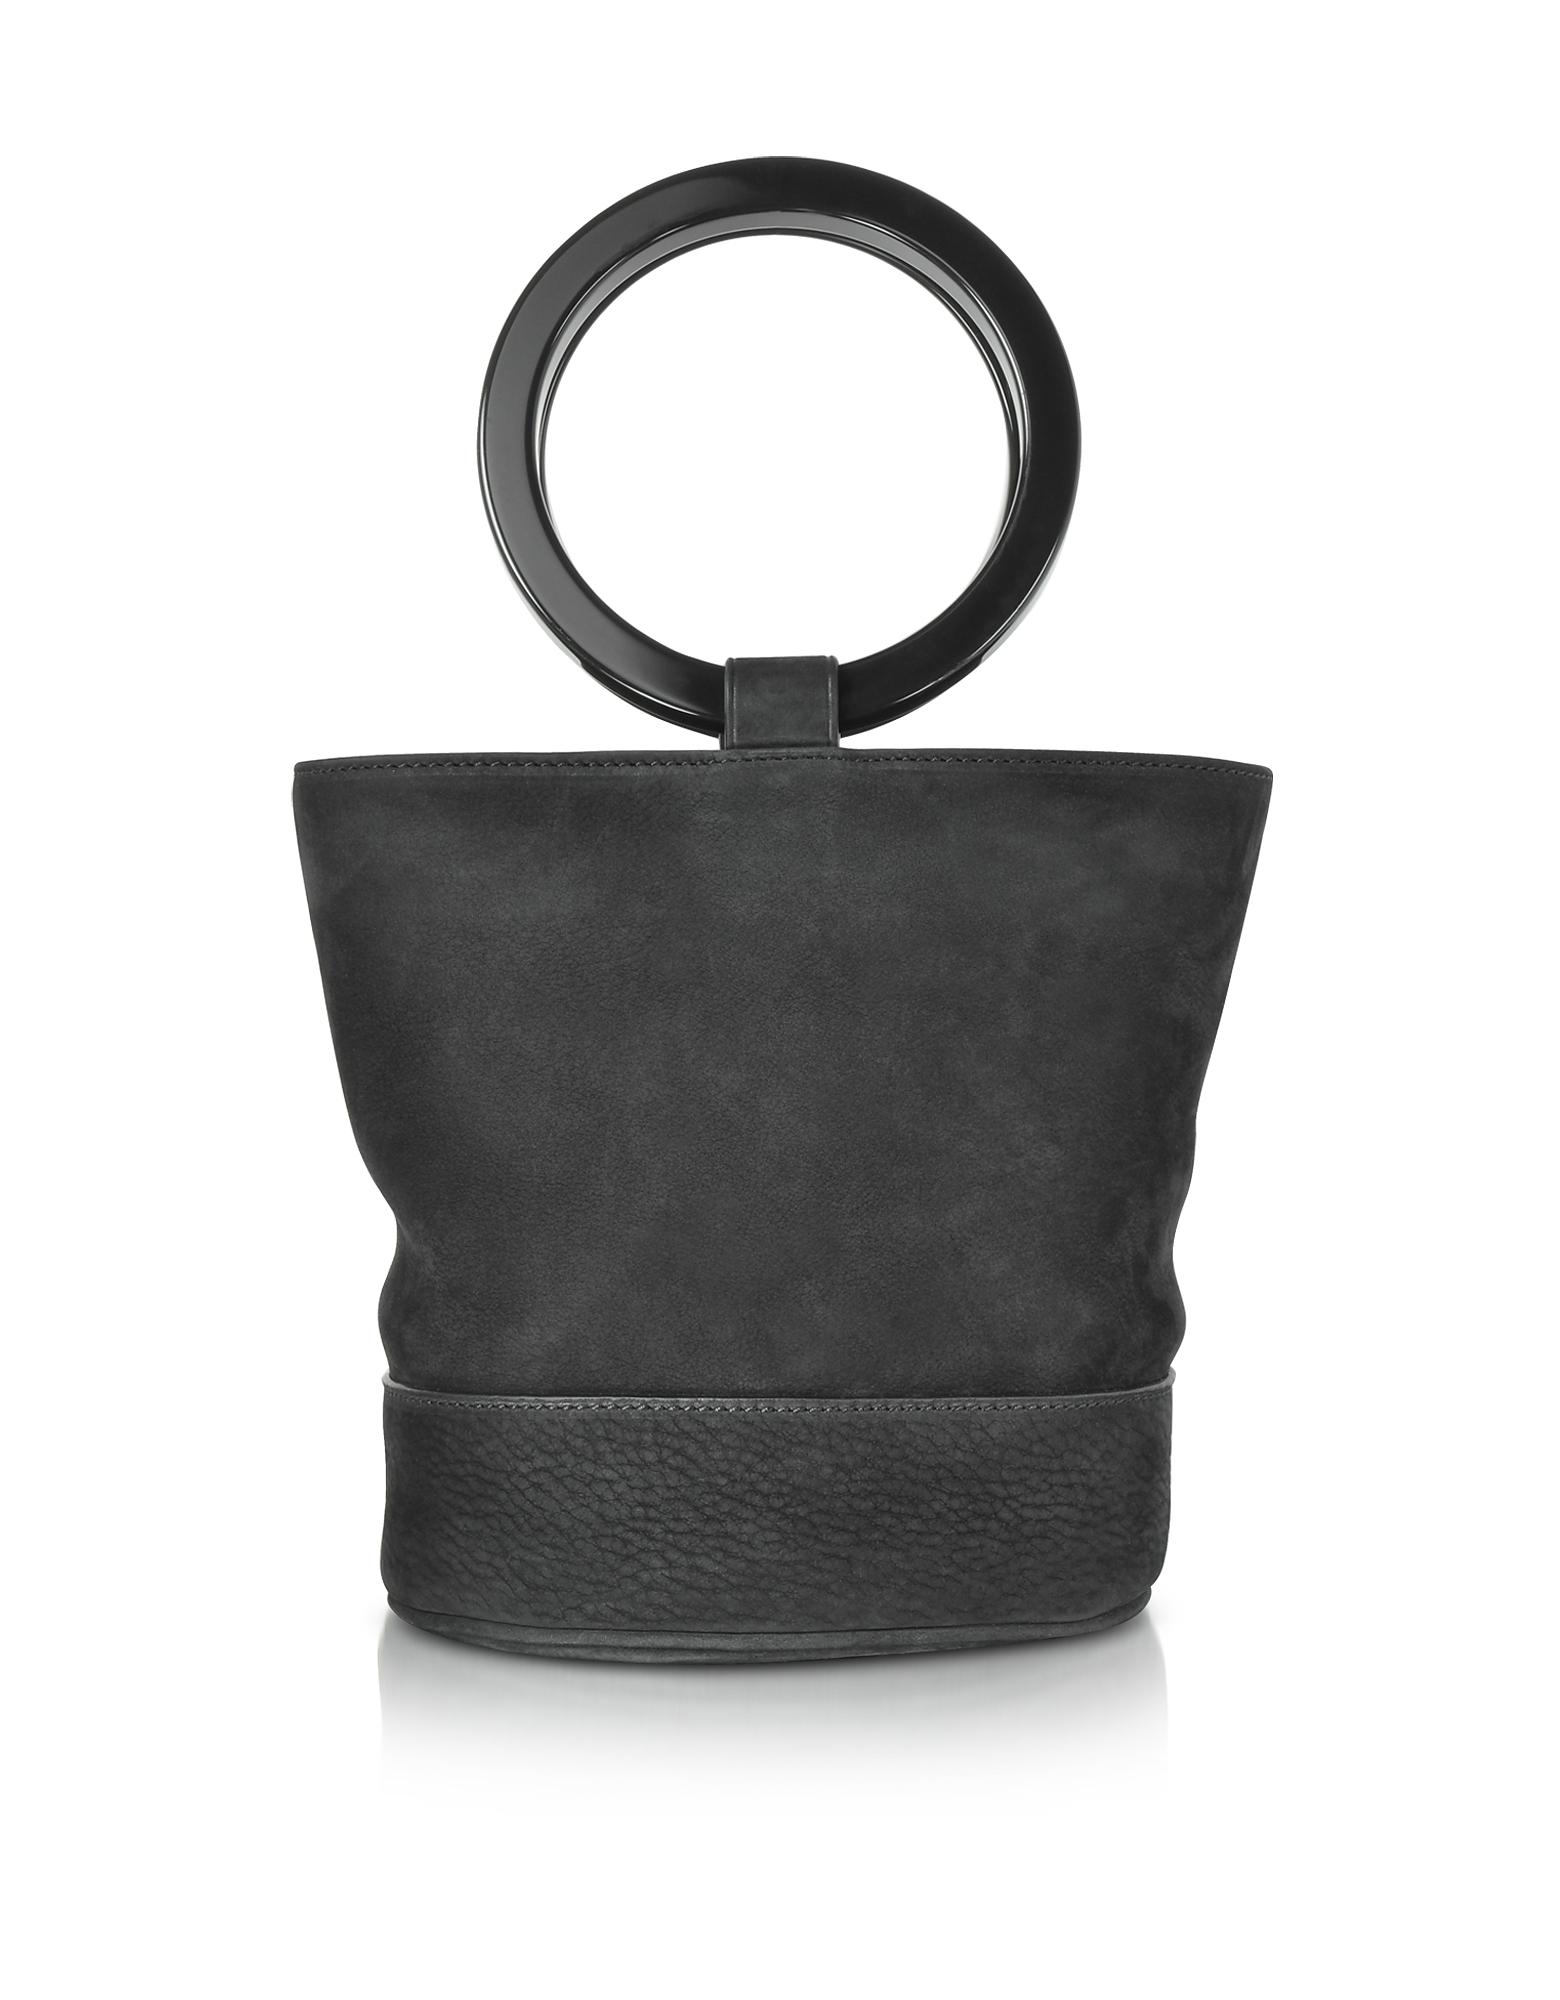 Simon Miller Handbags, S804 Black Nubuck Bonsai Bag